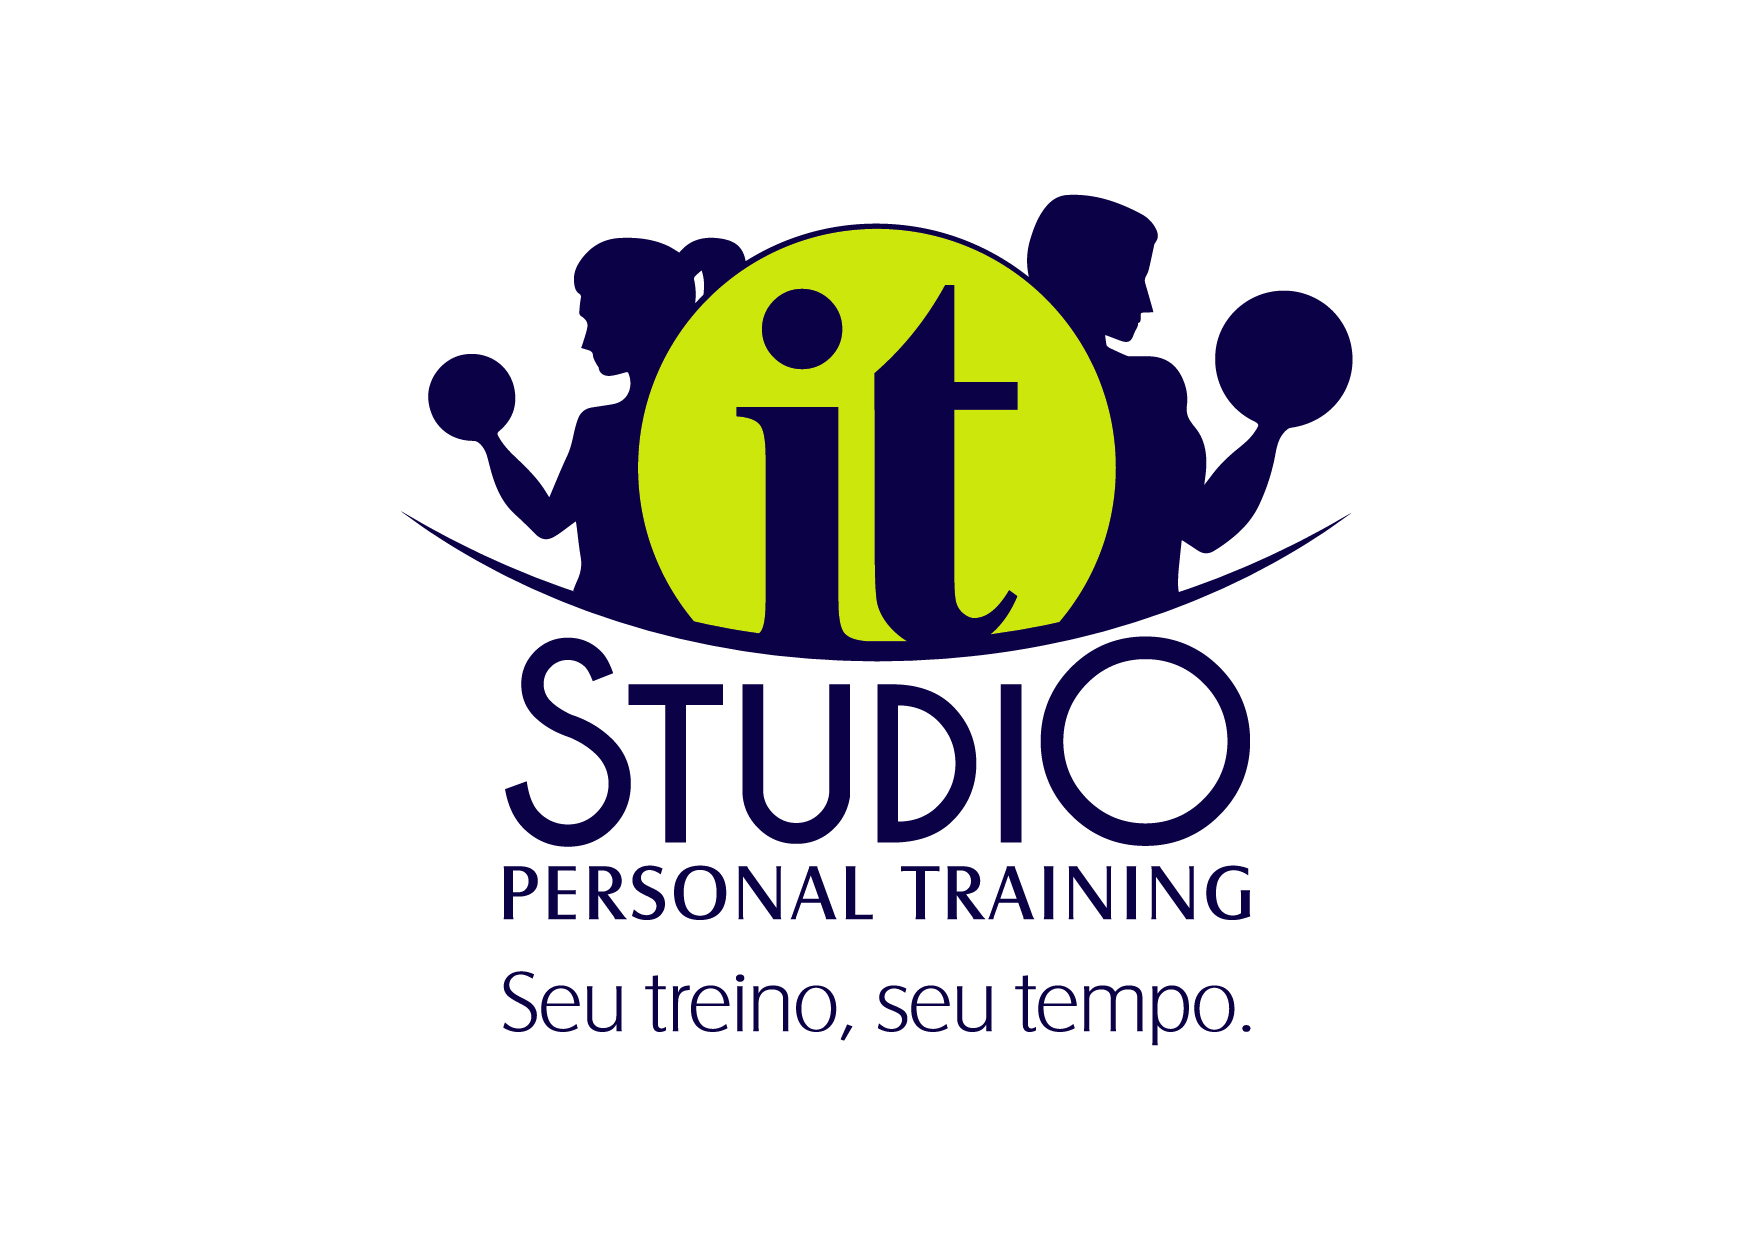 IT Studio Personal Training